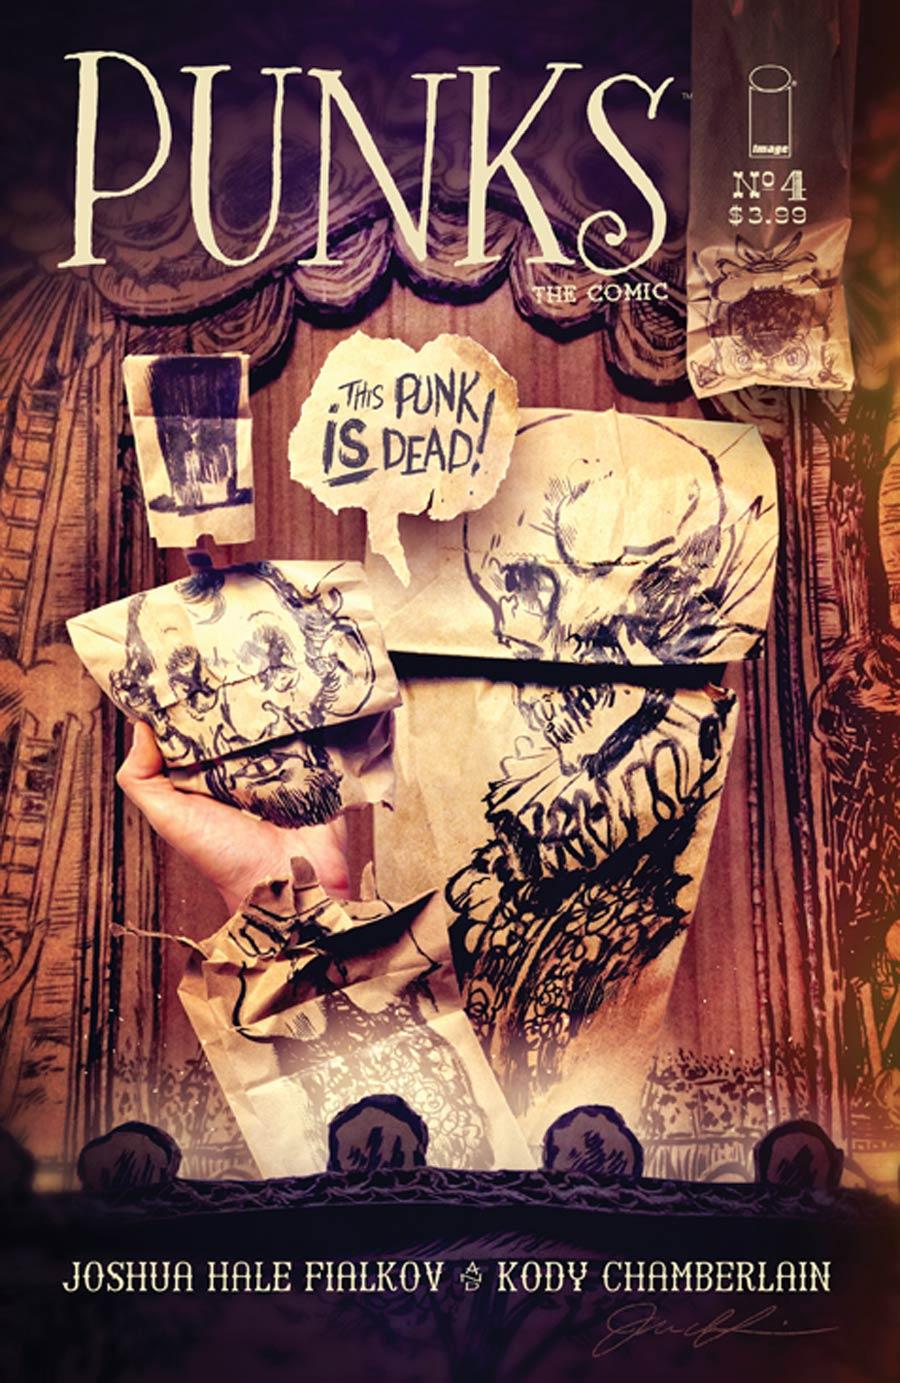 Punks The Comic #4 Cover B Joey Infurnari